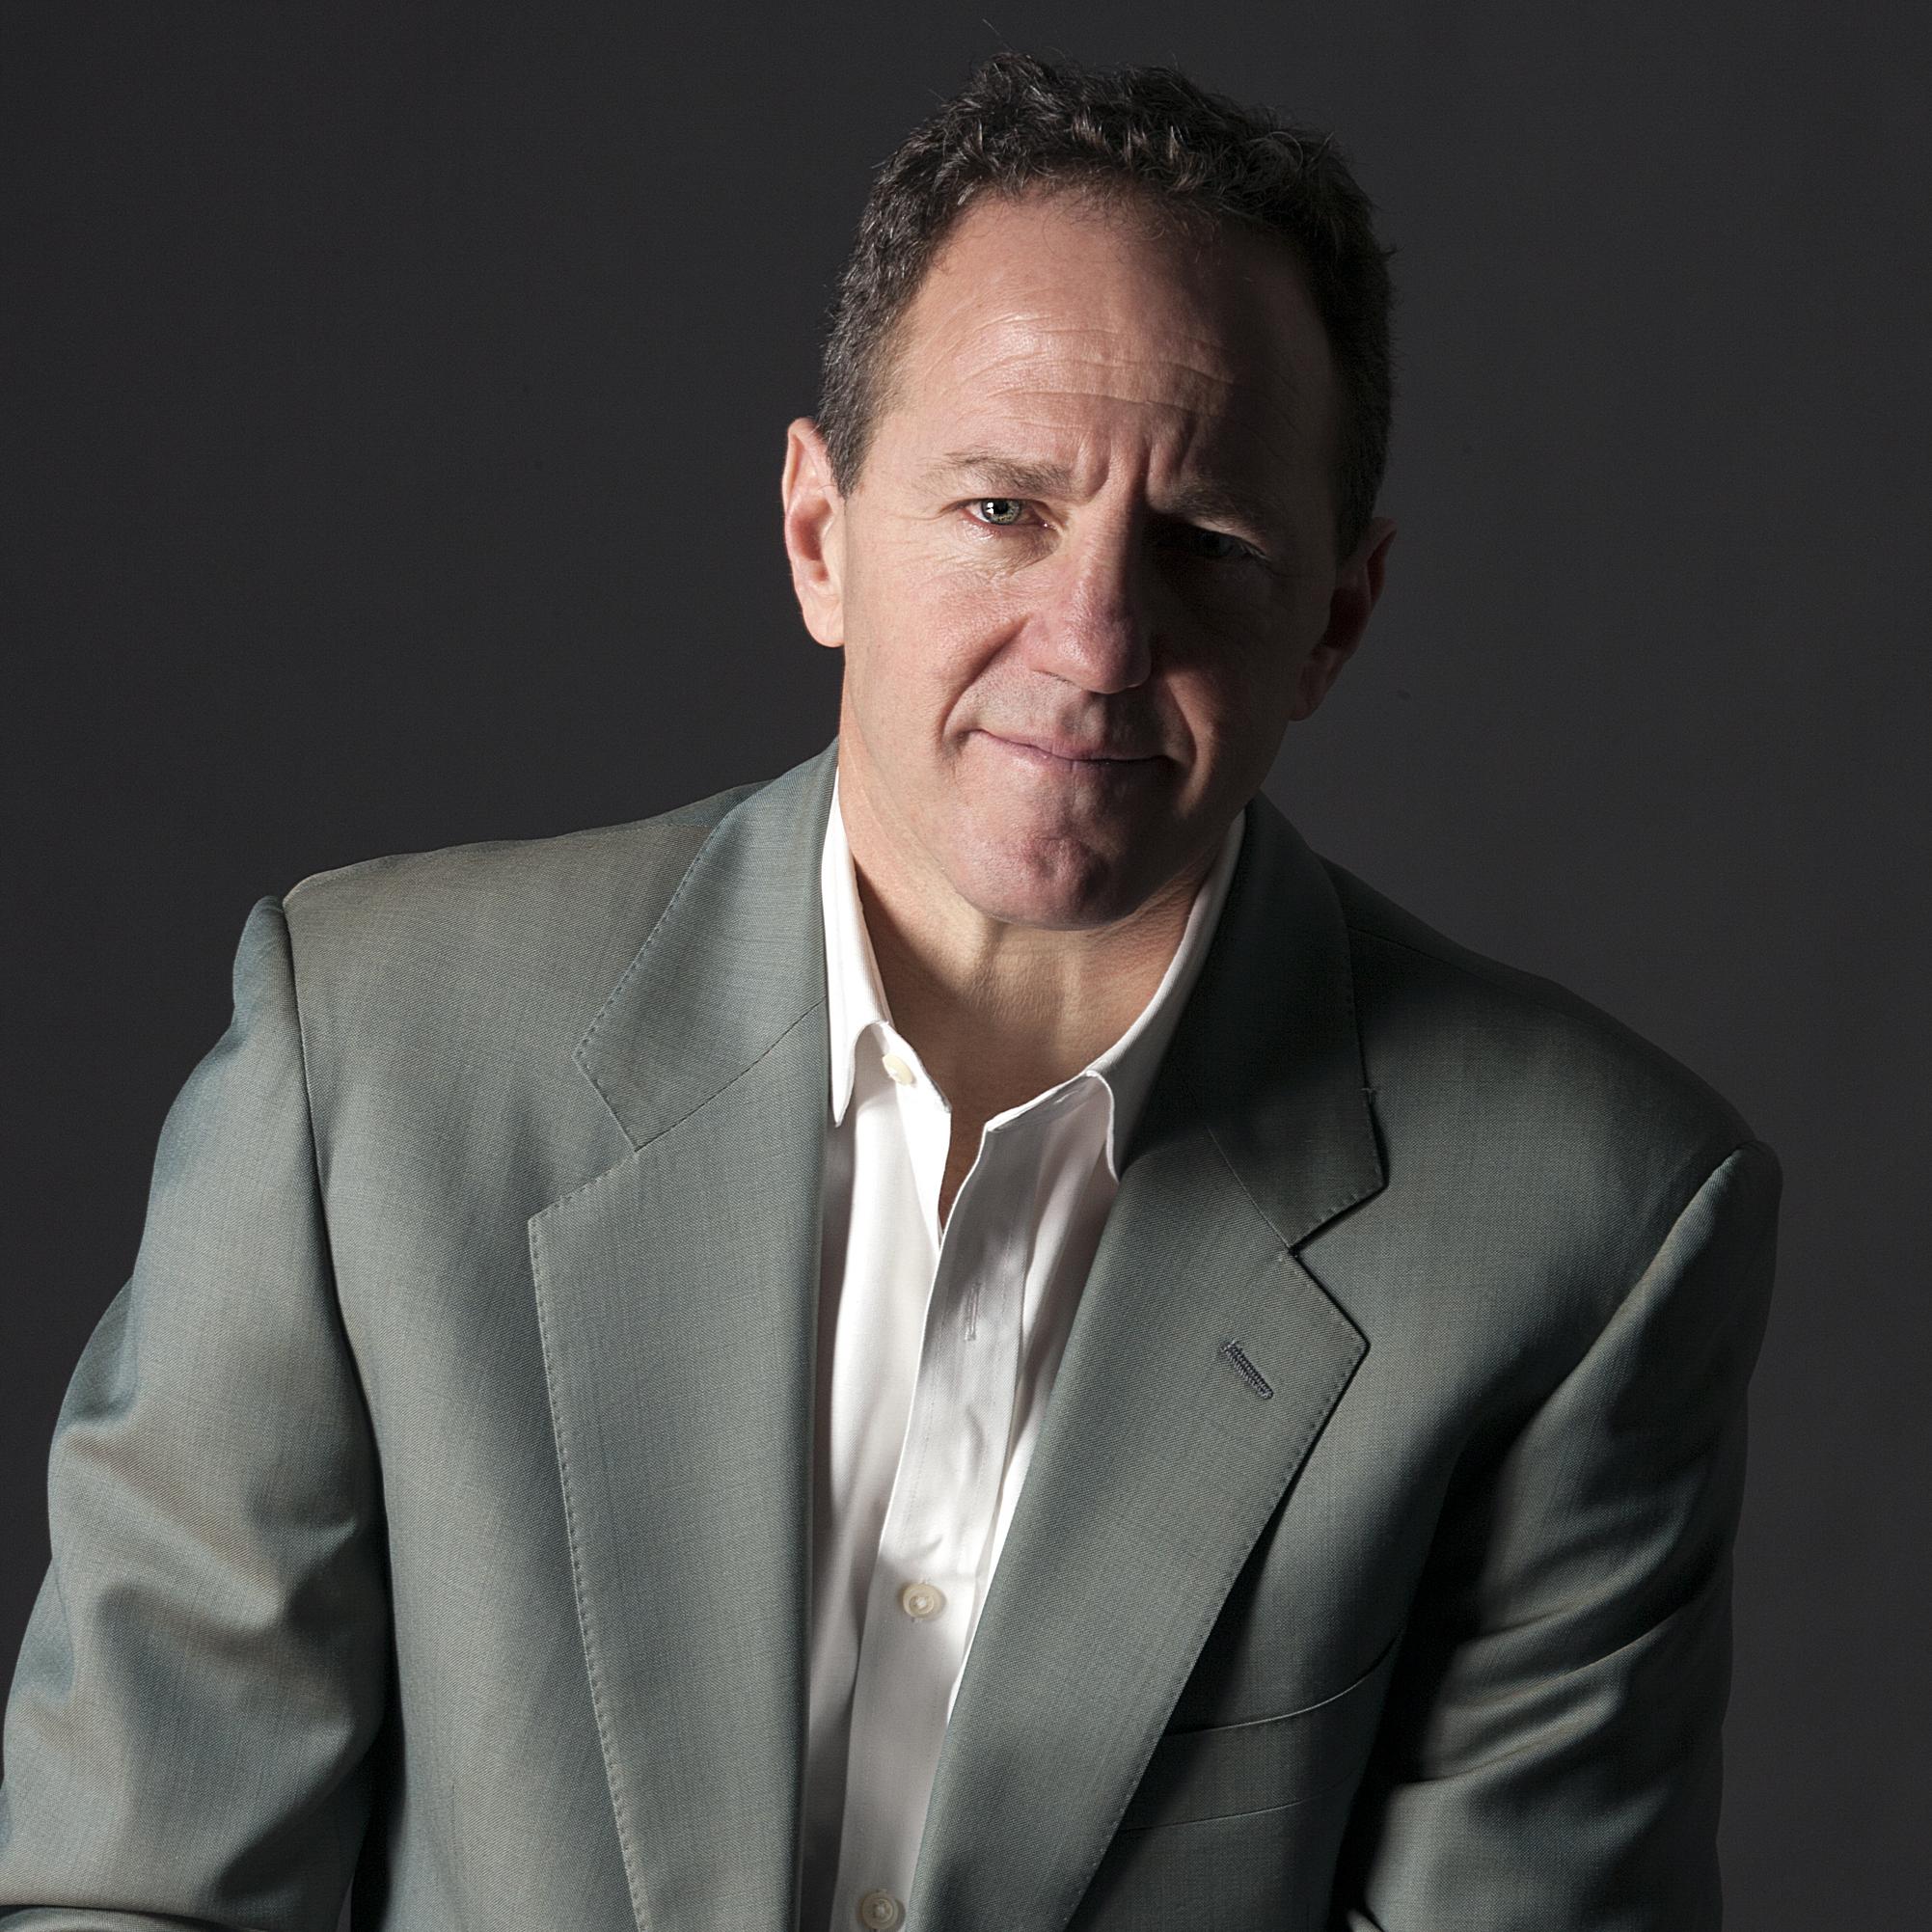 John Katzman